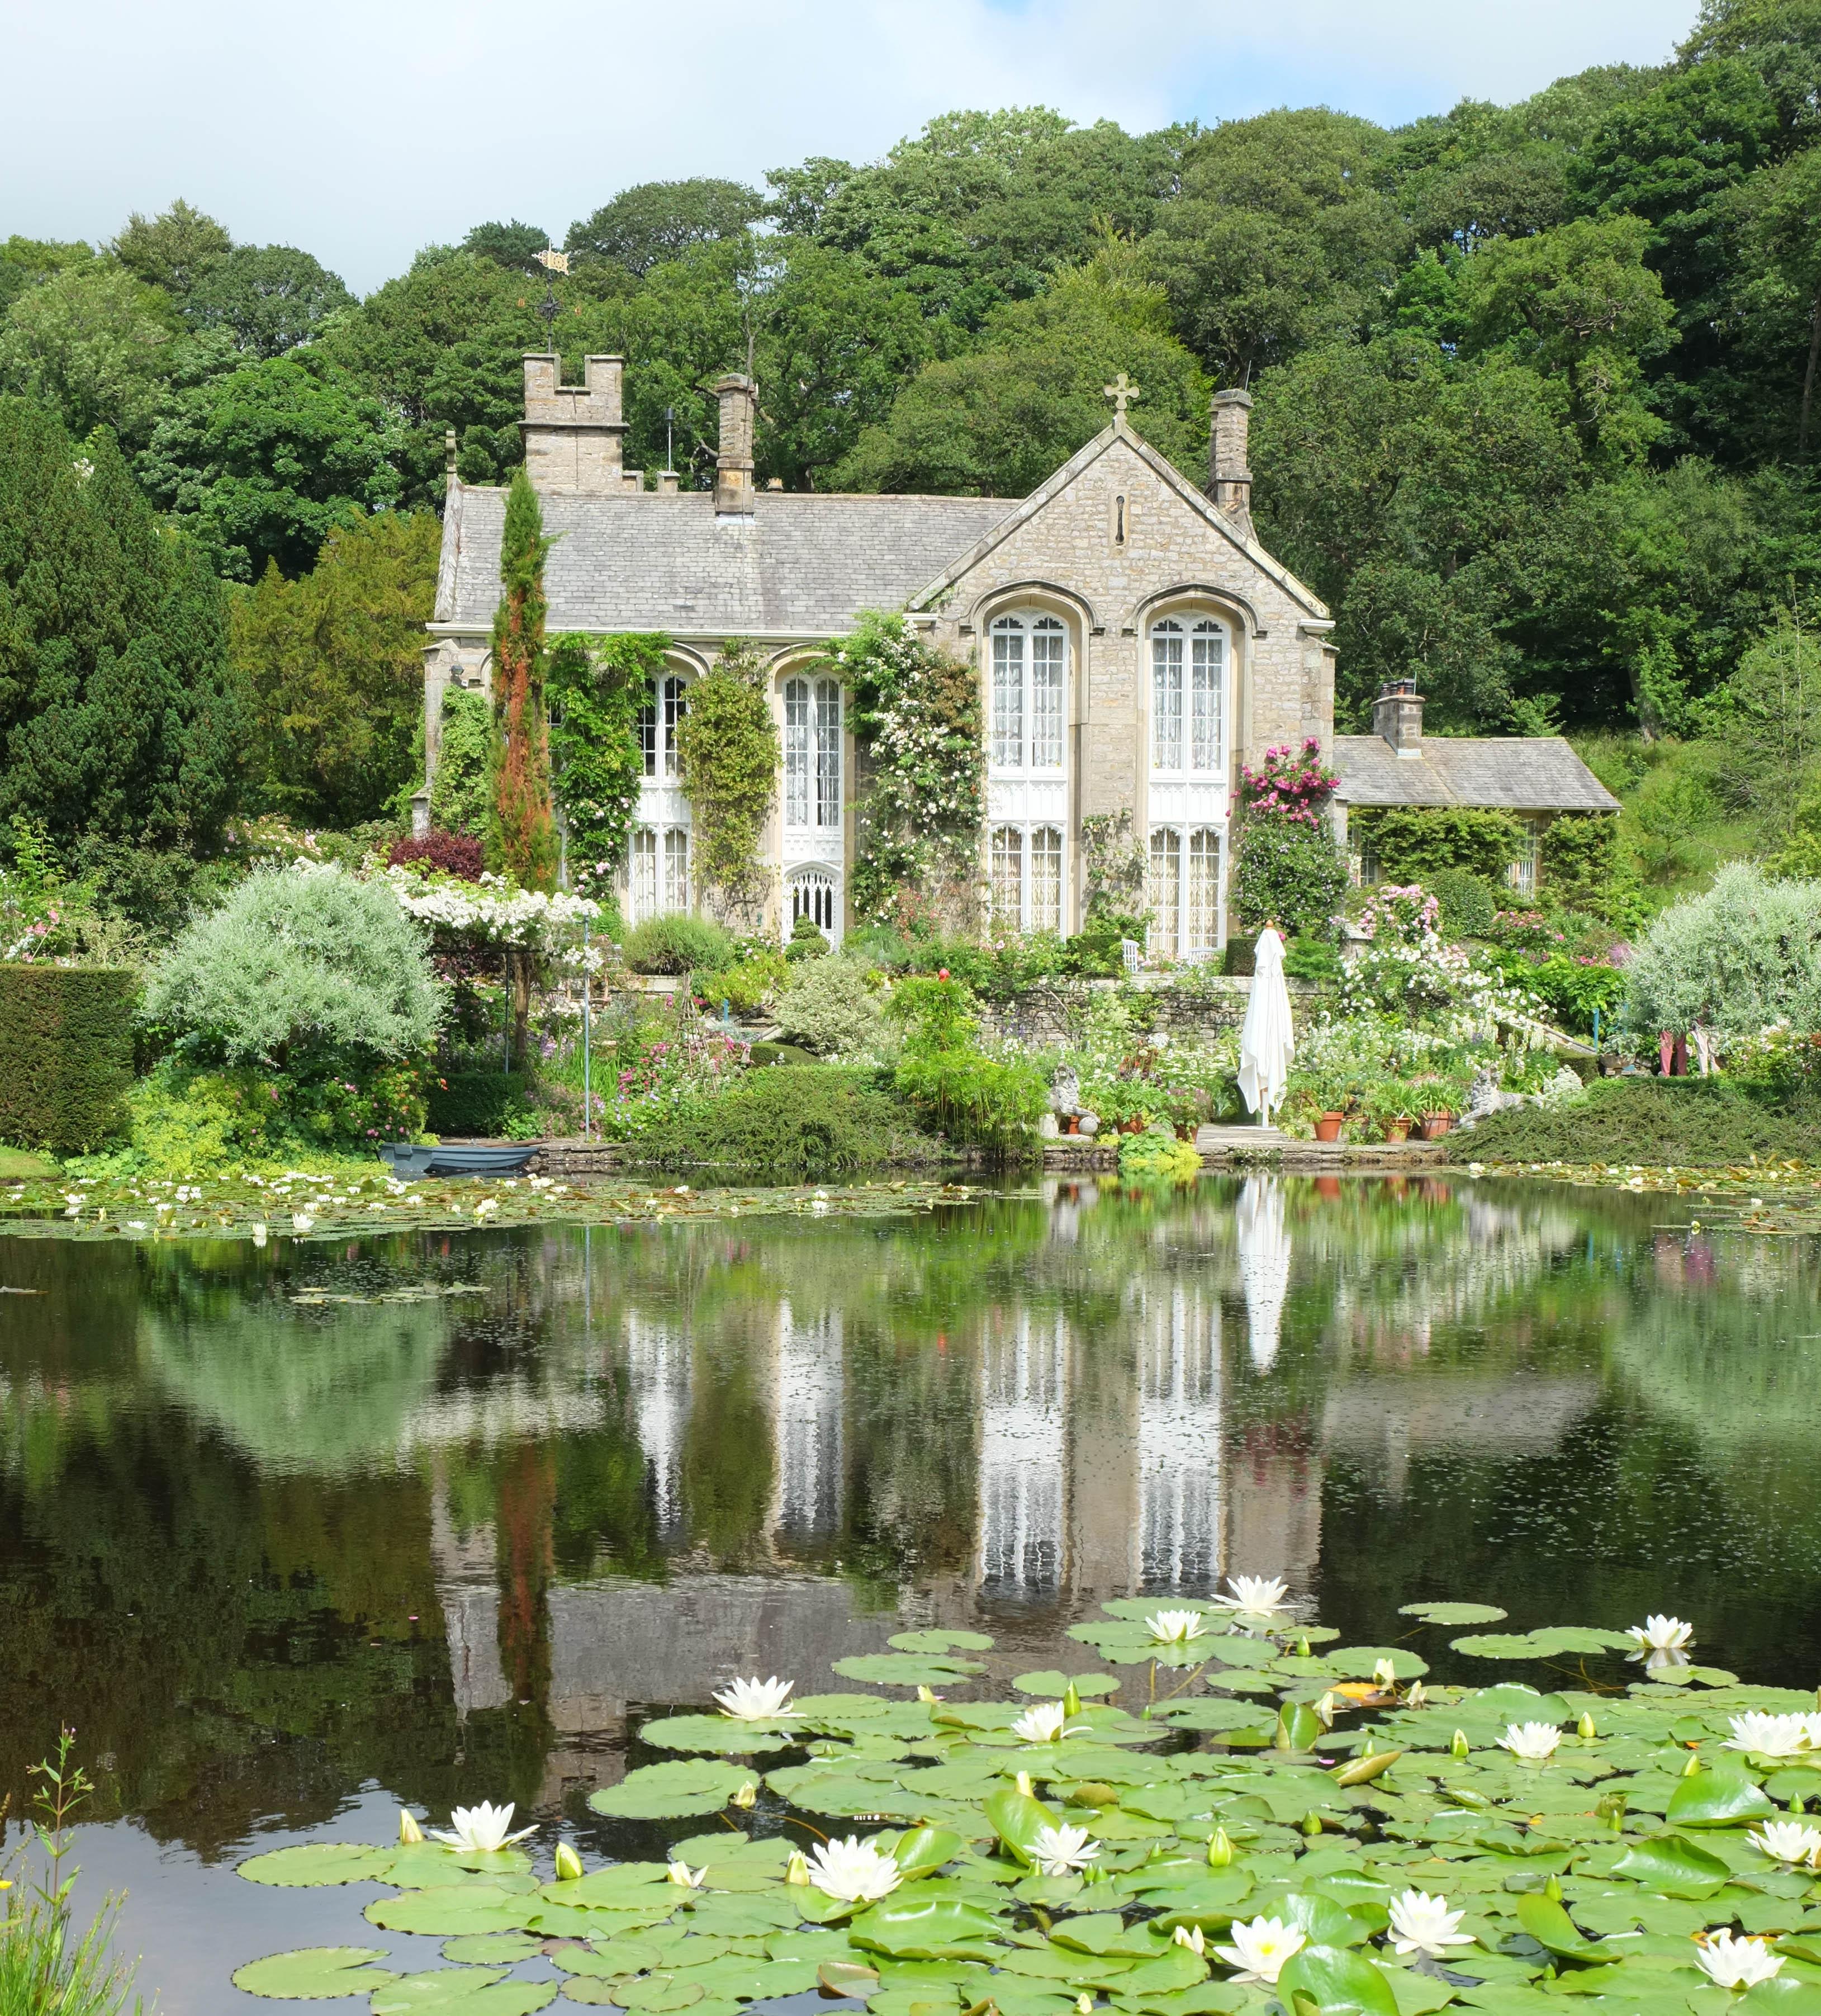 gresgarth hall gardens open day lancaster. Black Bedroom Furniture Sets. Home Design Ideas